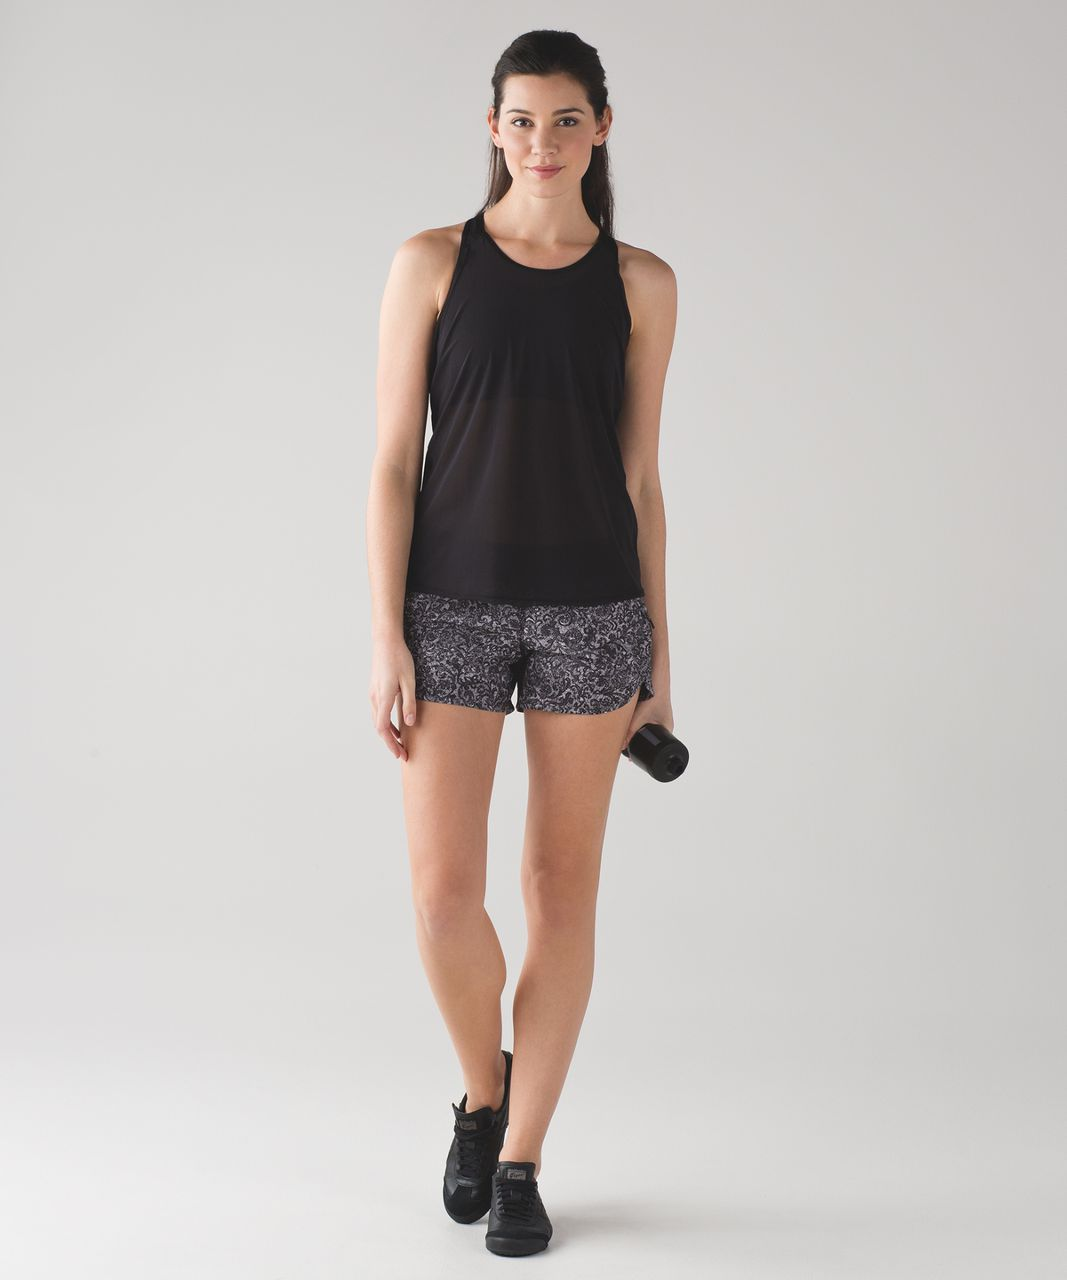 "Lululemon Tracker Short IV (4"") - Mini Cinder Lace White Black / Black"